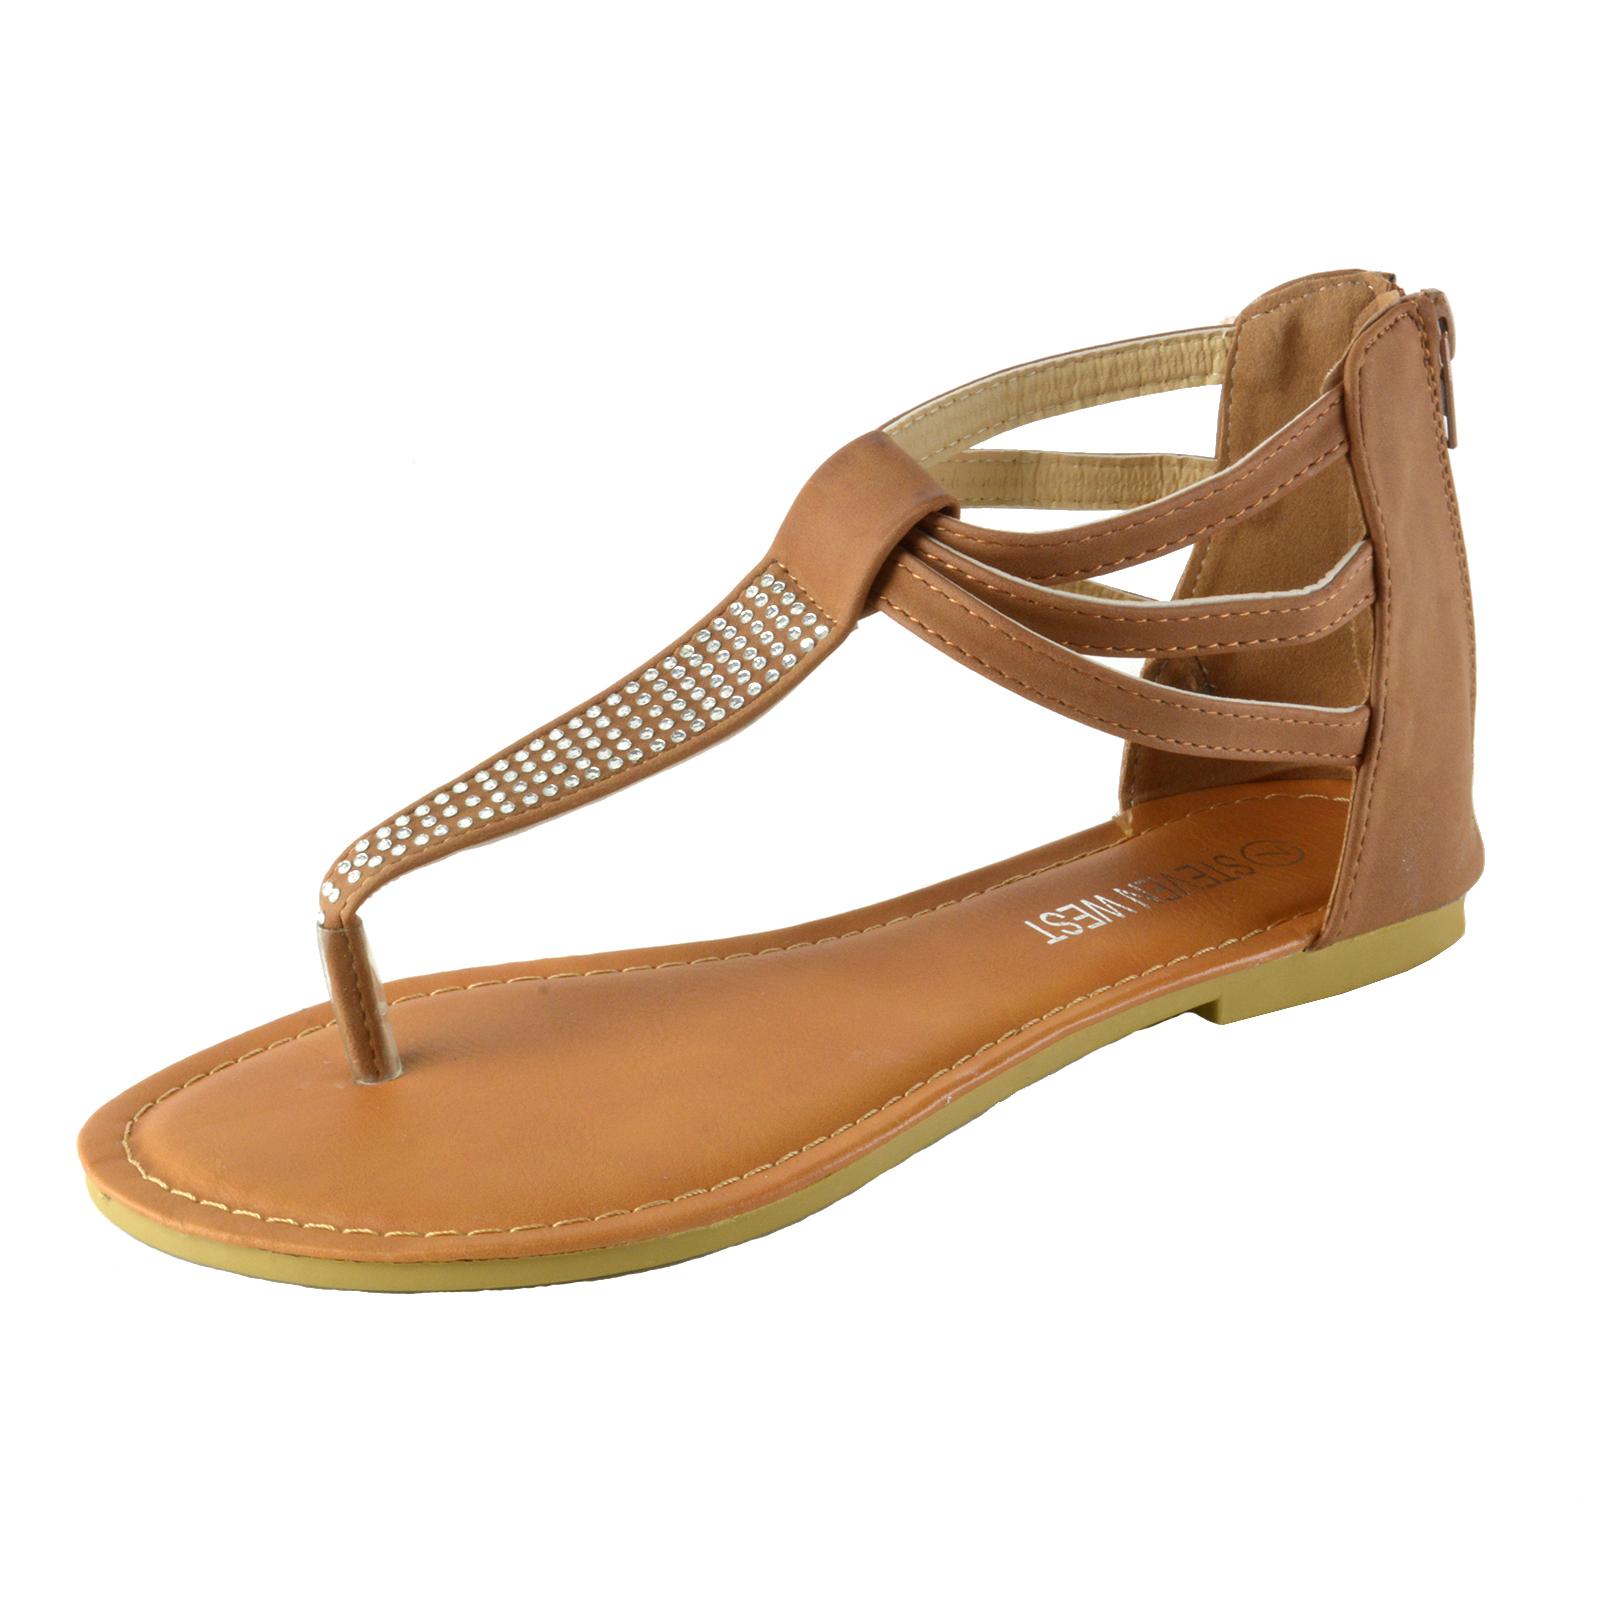 1ca7a8a40 Women s Rhinestone T-Strap Thong Ankle Strap Back Zip Gladiator Flat ...